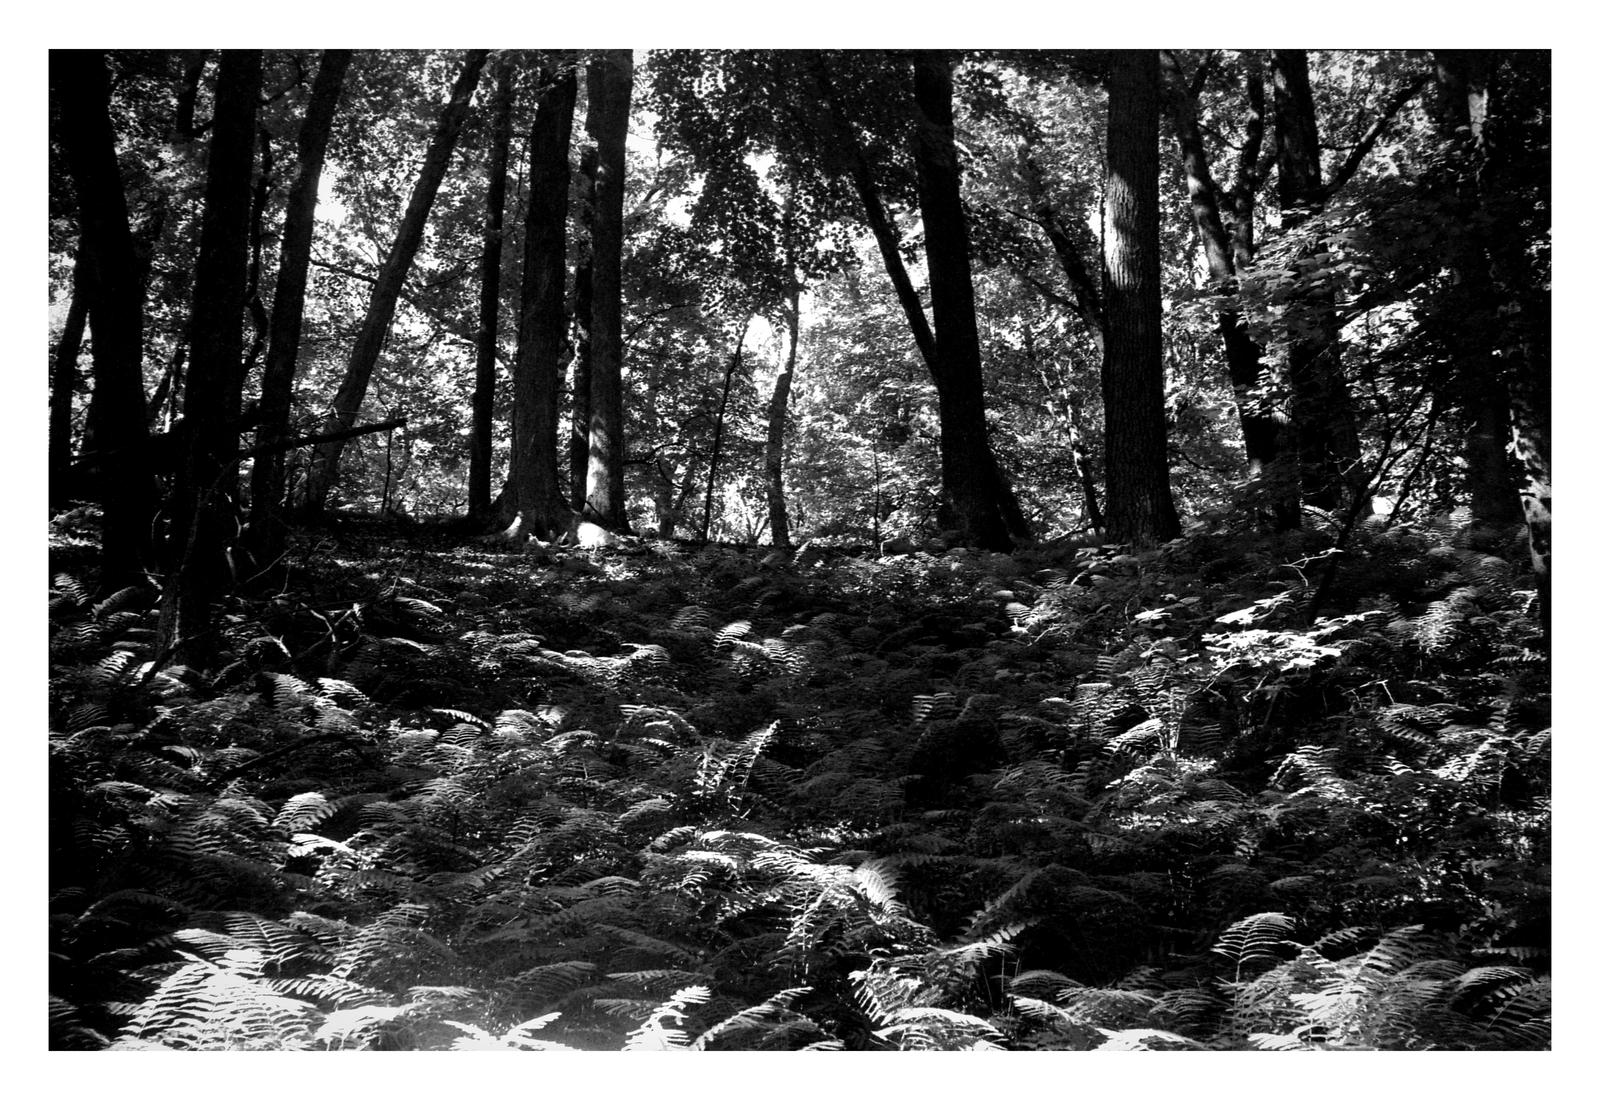 2020-194 Forest ferns